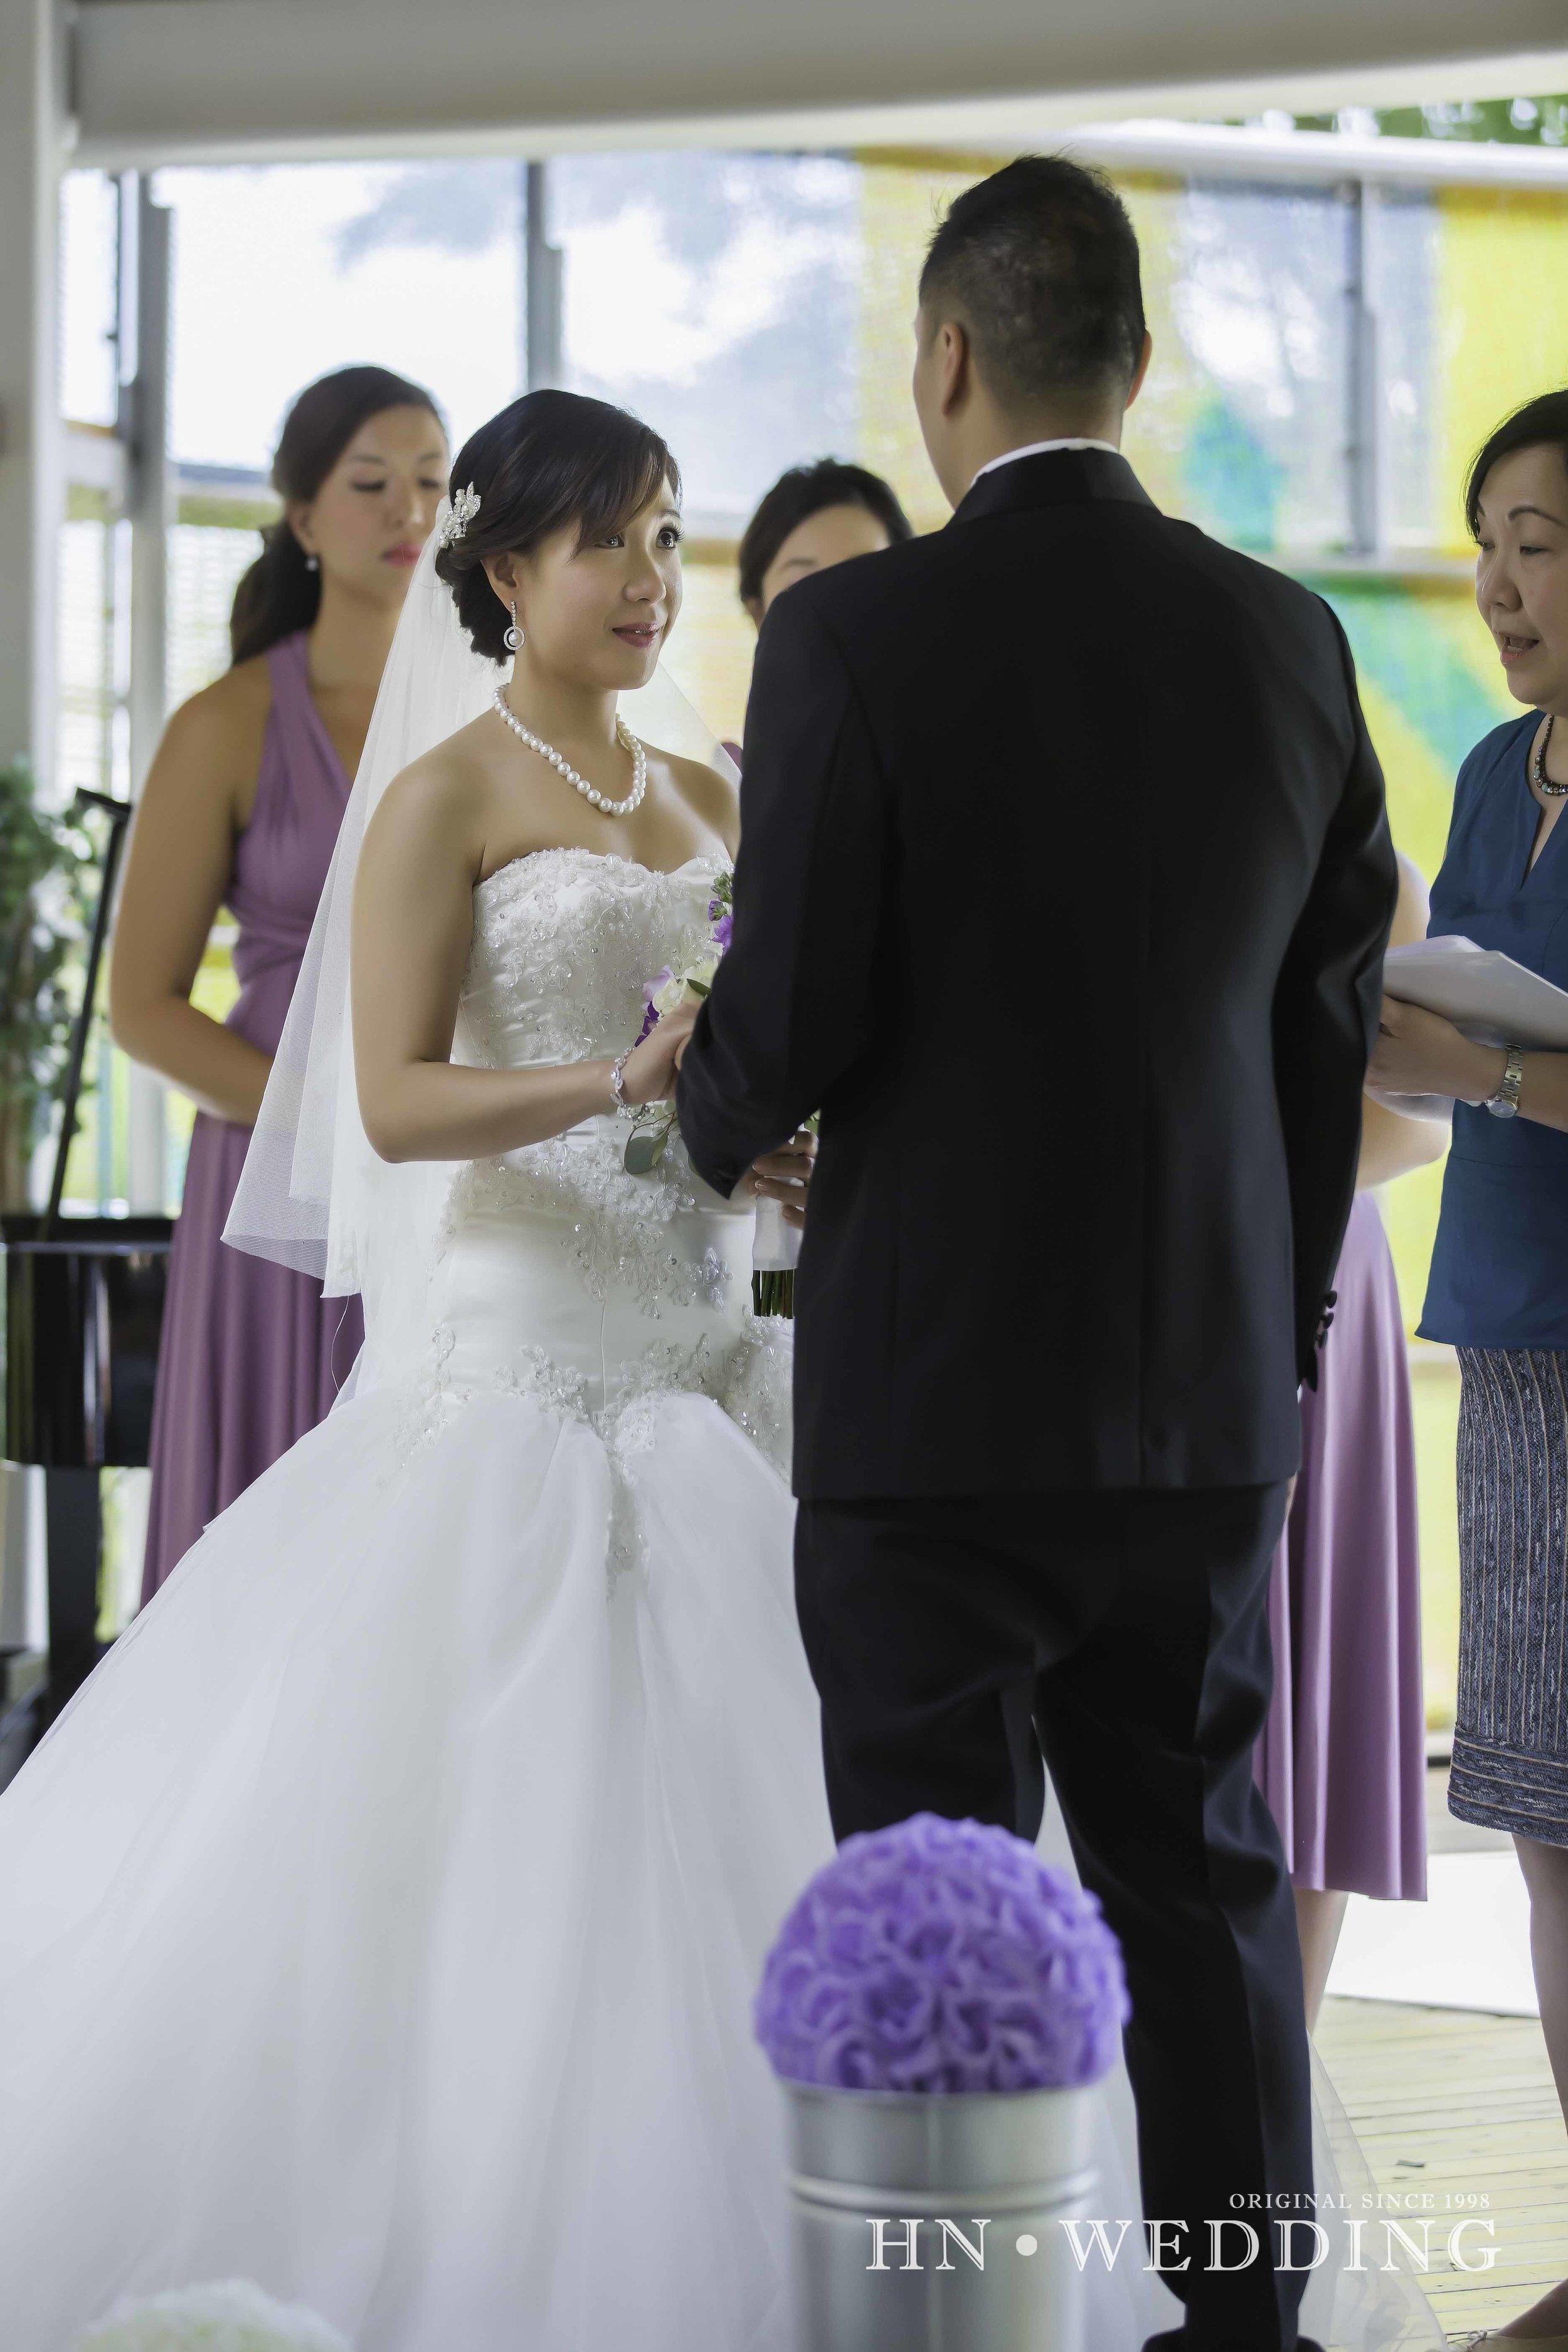 HNwedding-20160822-wedding-6156.jpg